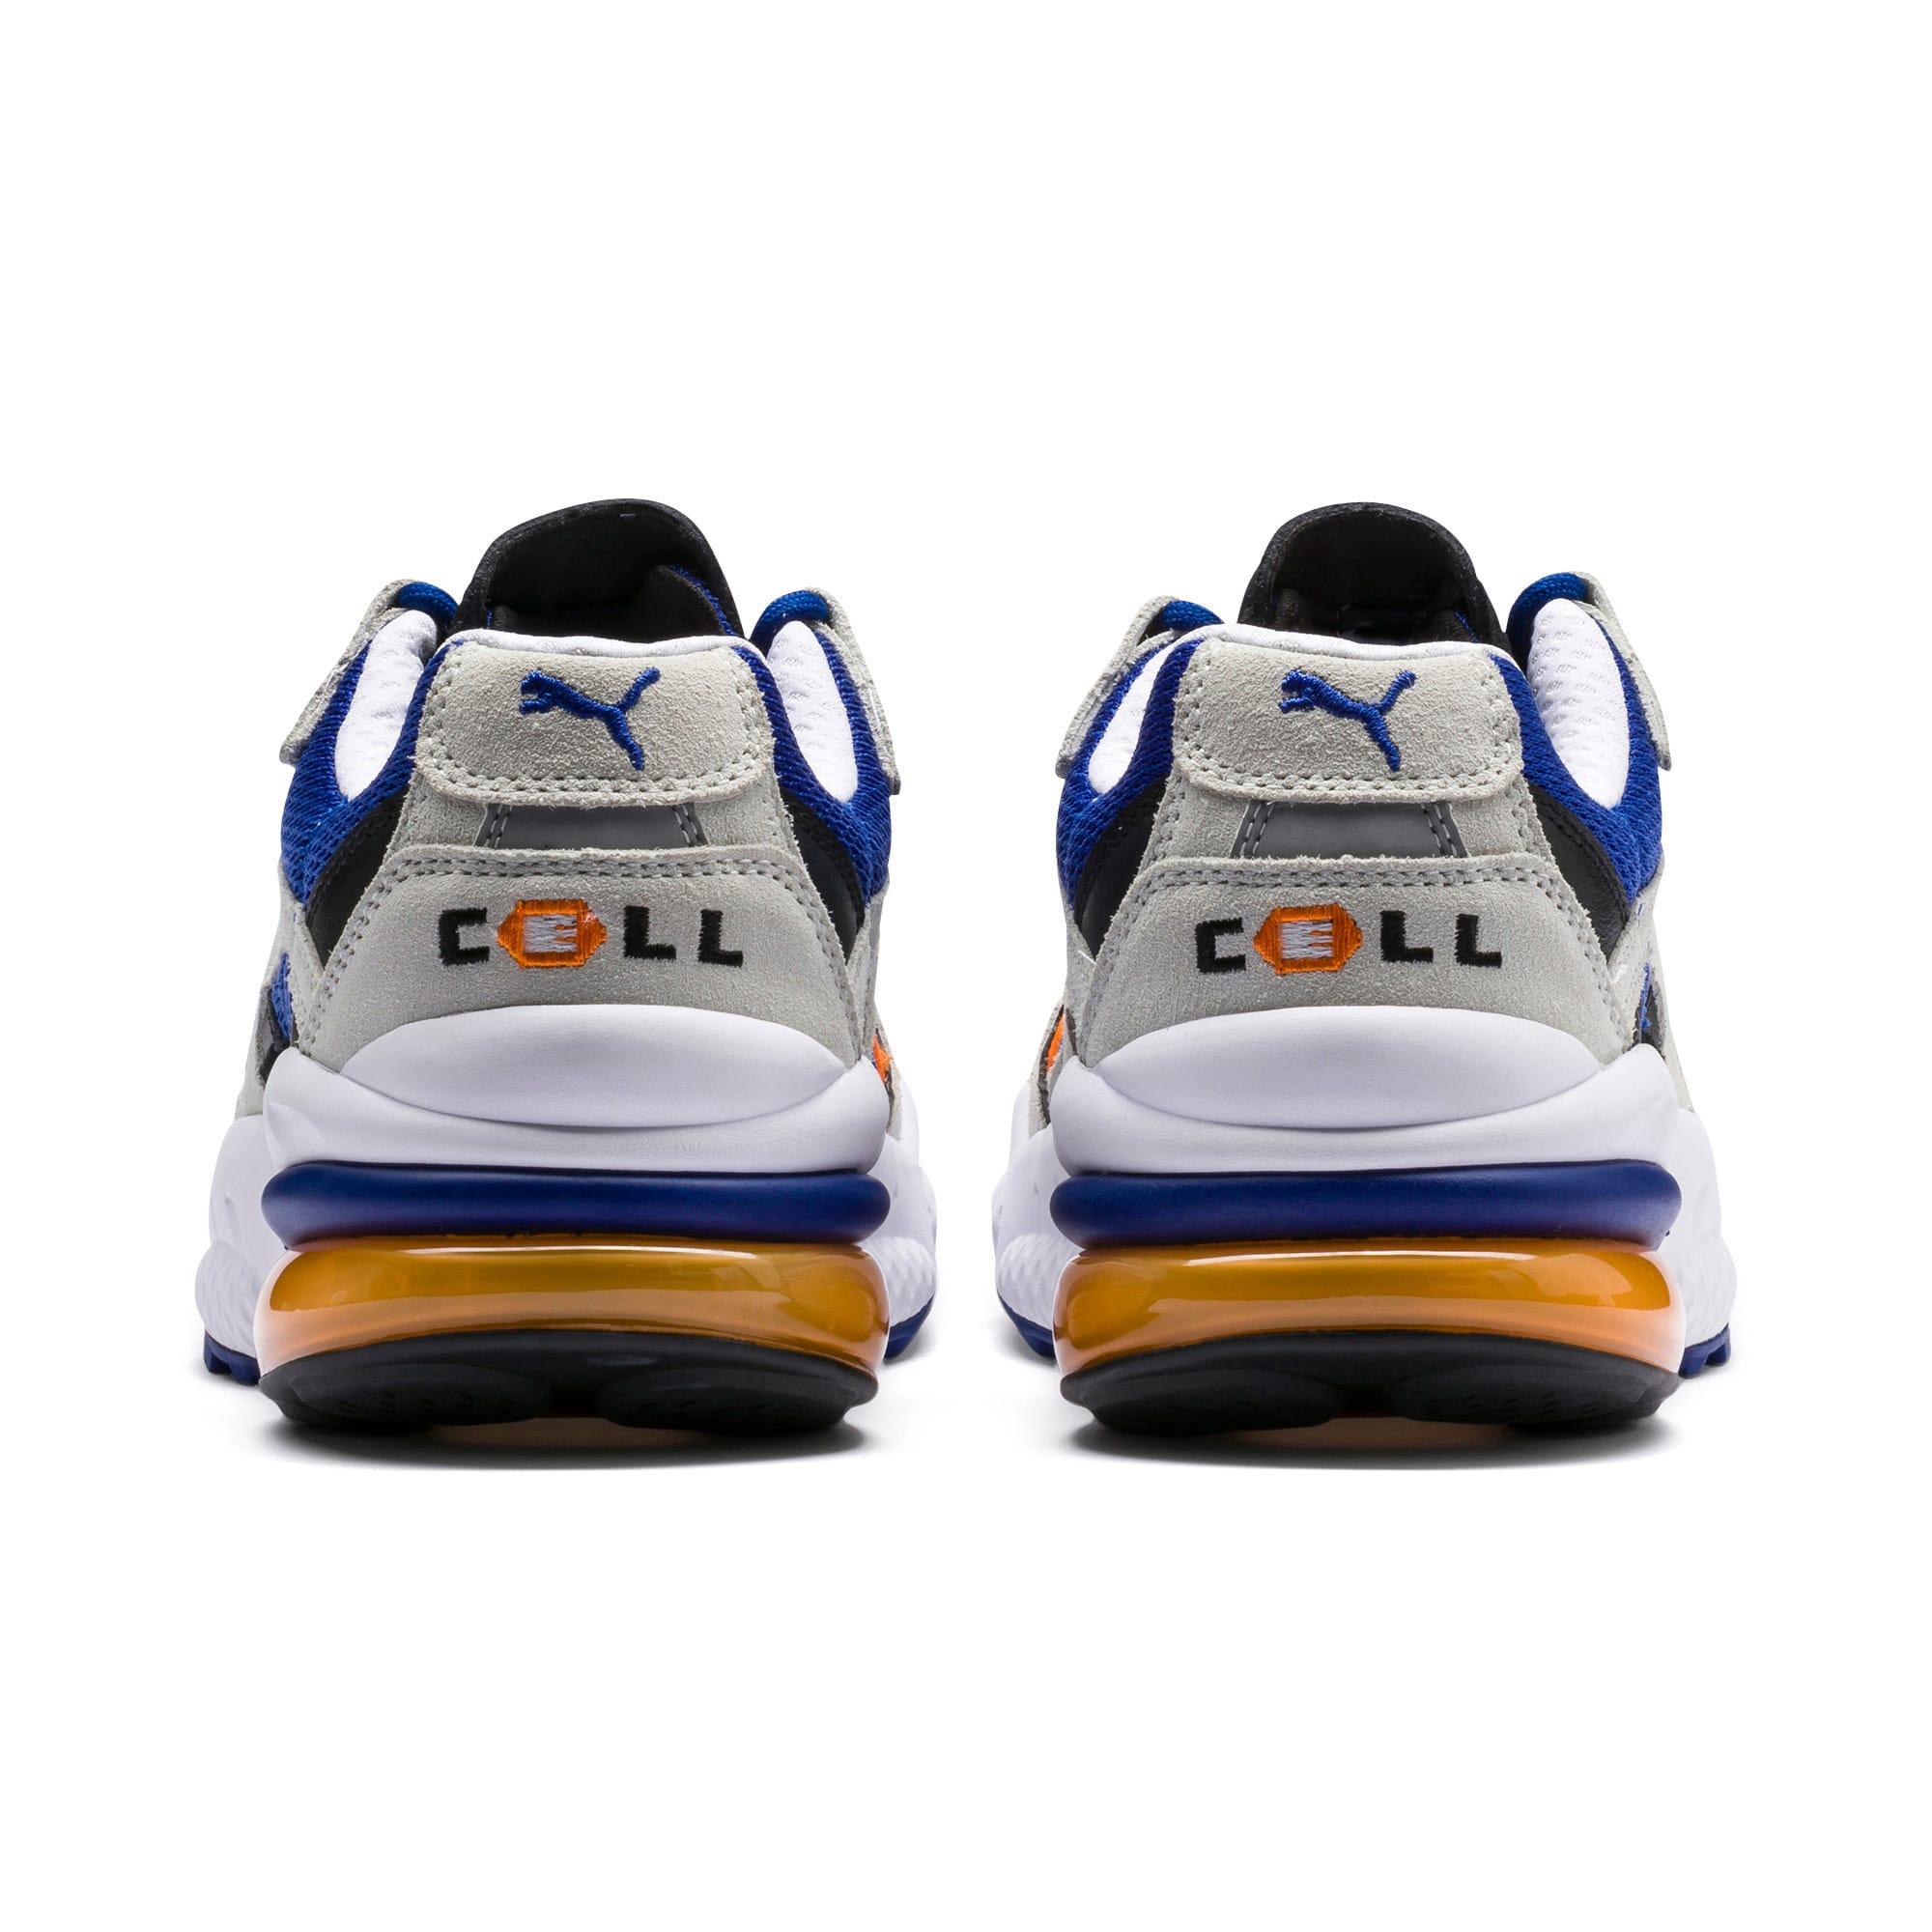 Thumbnail 4 of CELL Venom Men's Sneakers, Surf The Web-Puma White, medium